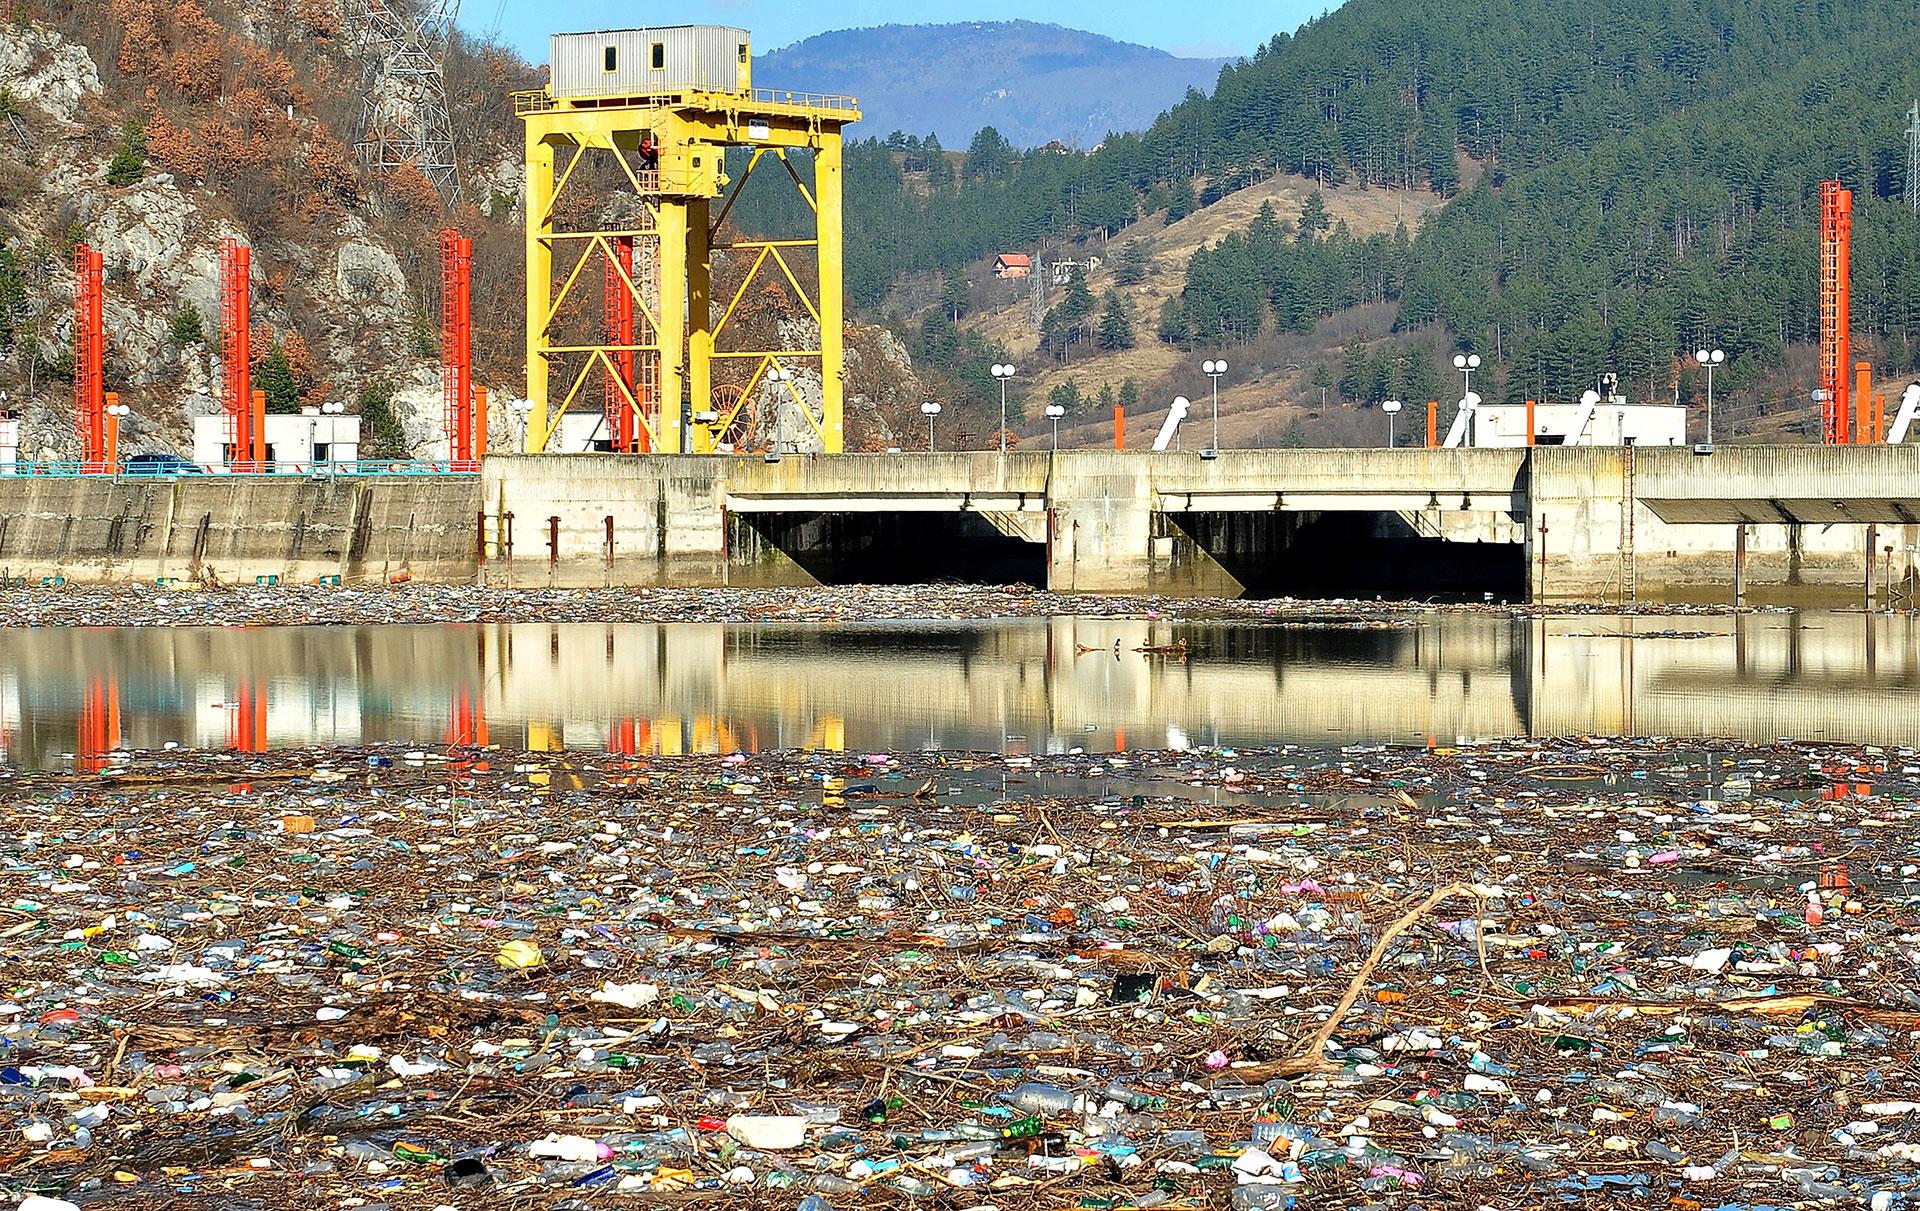 C'è un fiume di rifiuti che attraversa i Balcani